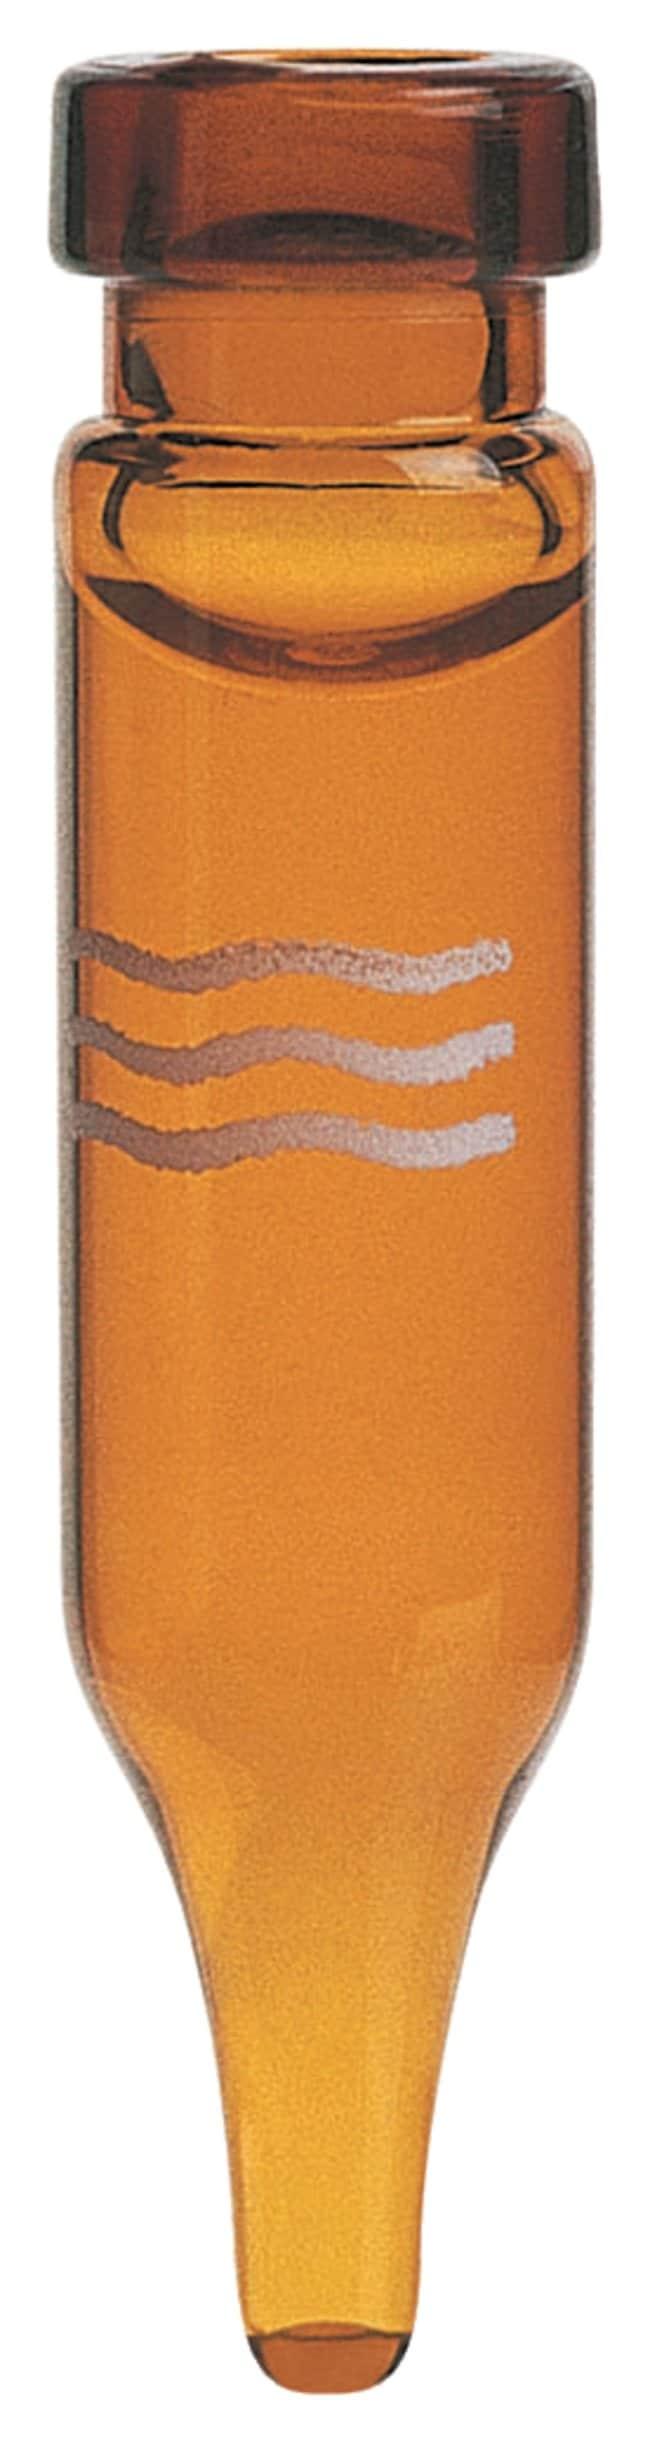 Thermo Scientific SUN-SRi 8mm Microsampling Vials :Chromatography:Autosampler